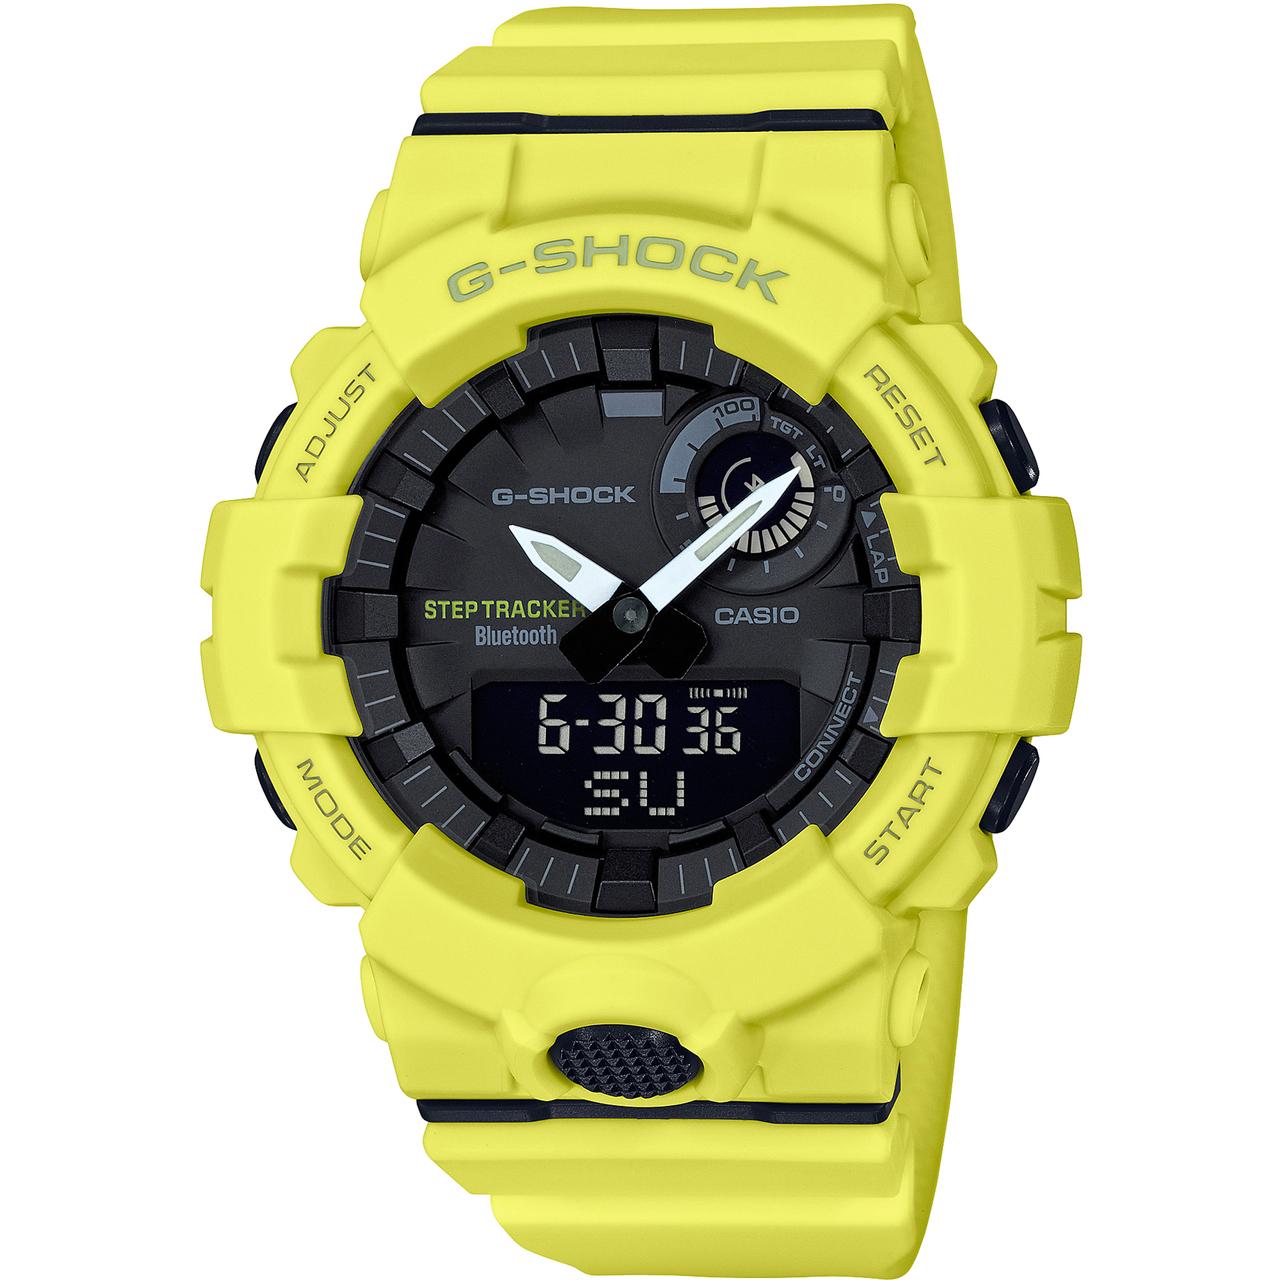 c9ebe8989363d Casio G-Shock Bluetooth Step Tracker